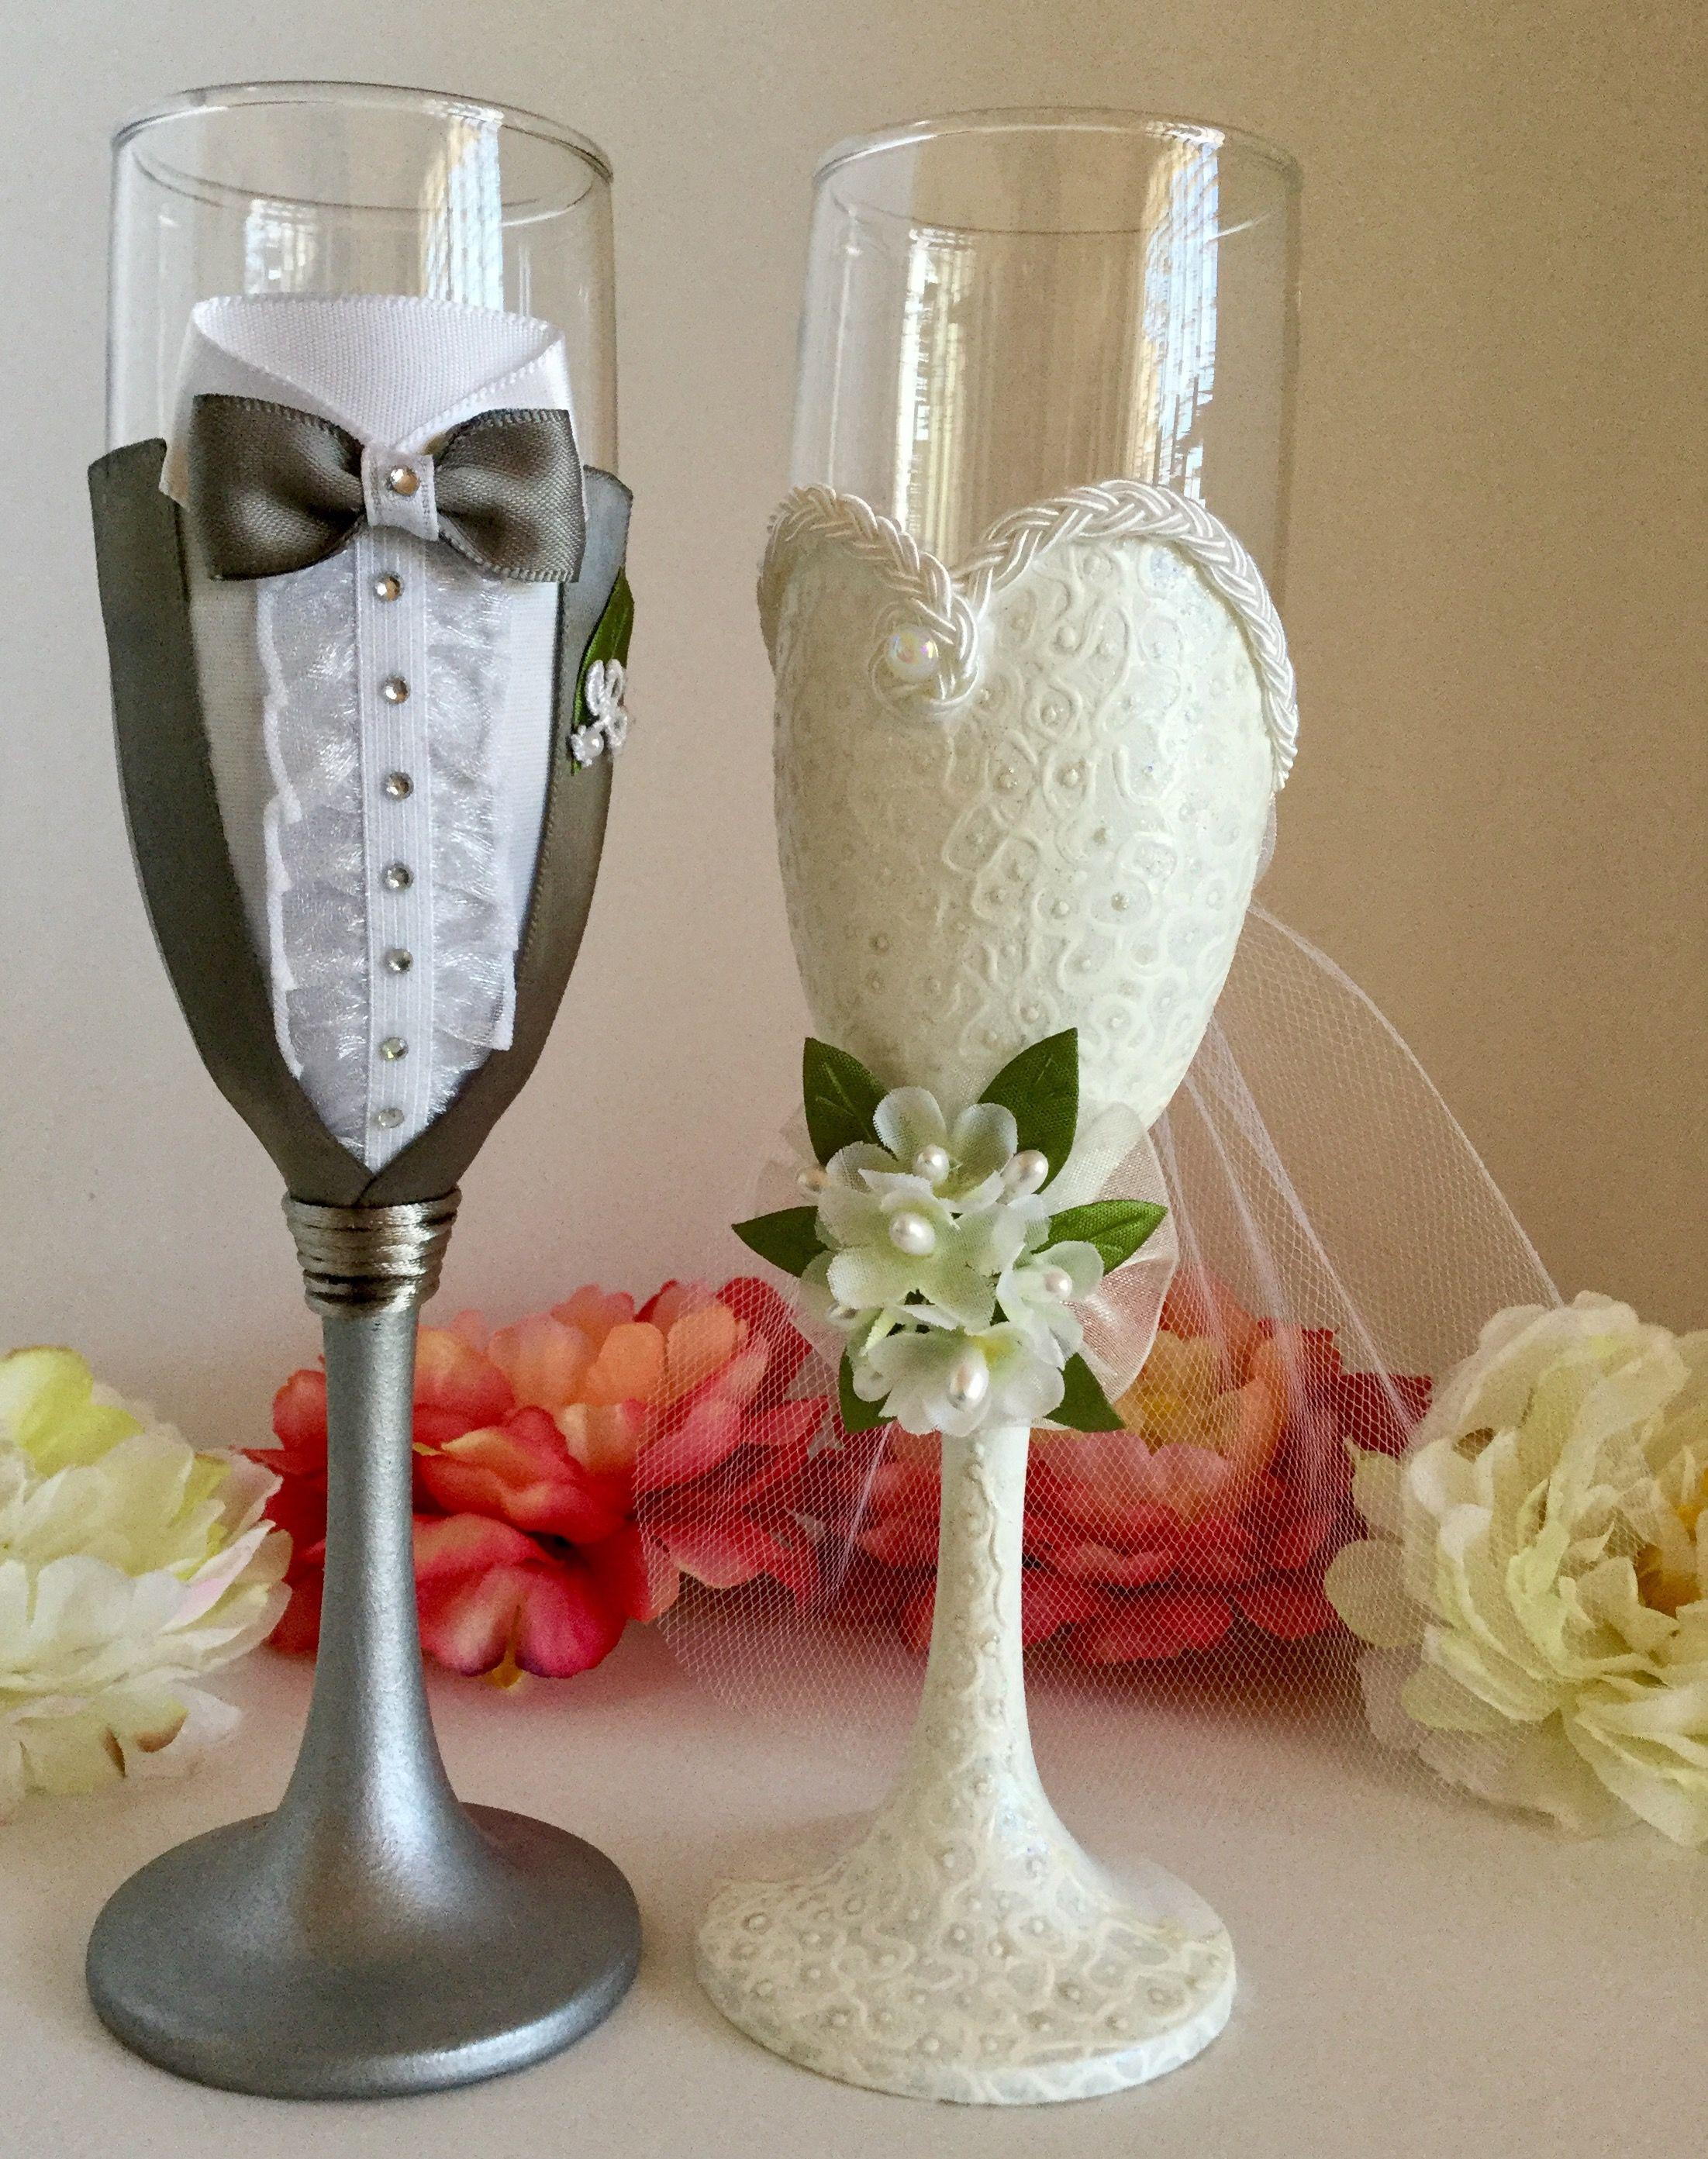 Pin By Iselart On Wedding Wine Glasses Champagne Glasses Decorated Bridal Glasses Wedding Wine Glasses